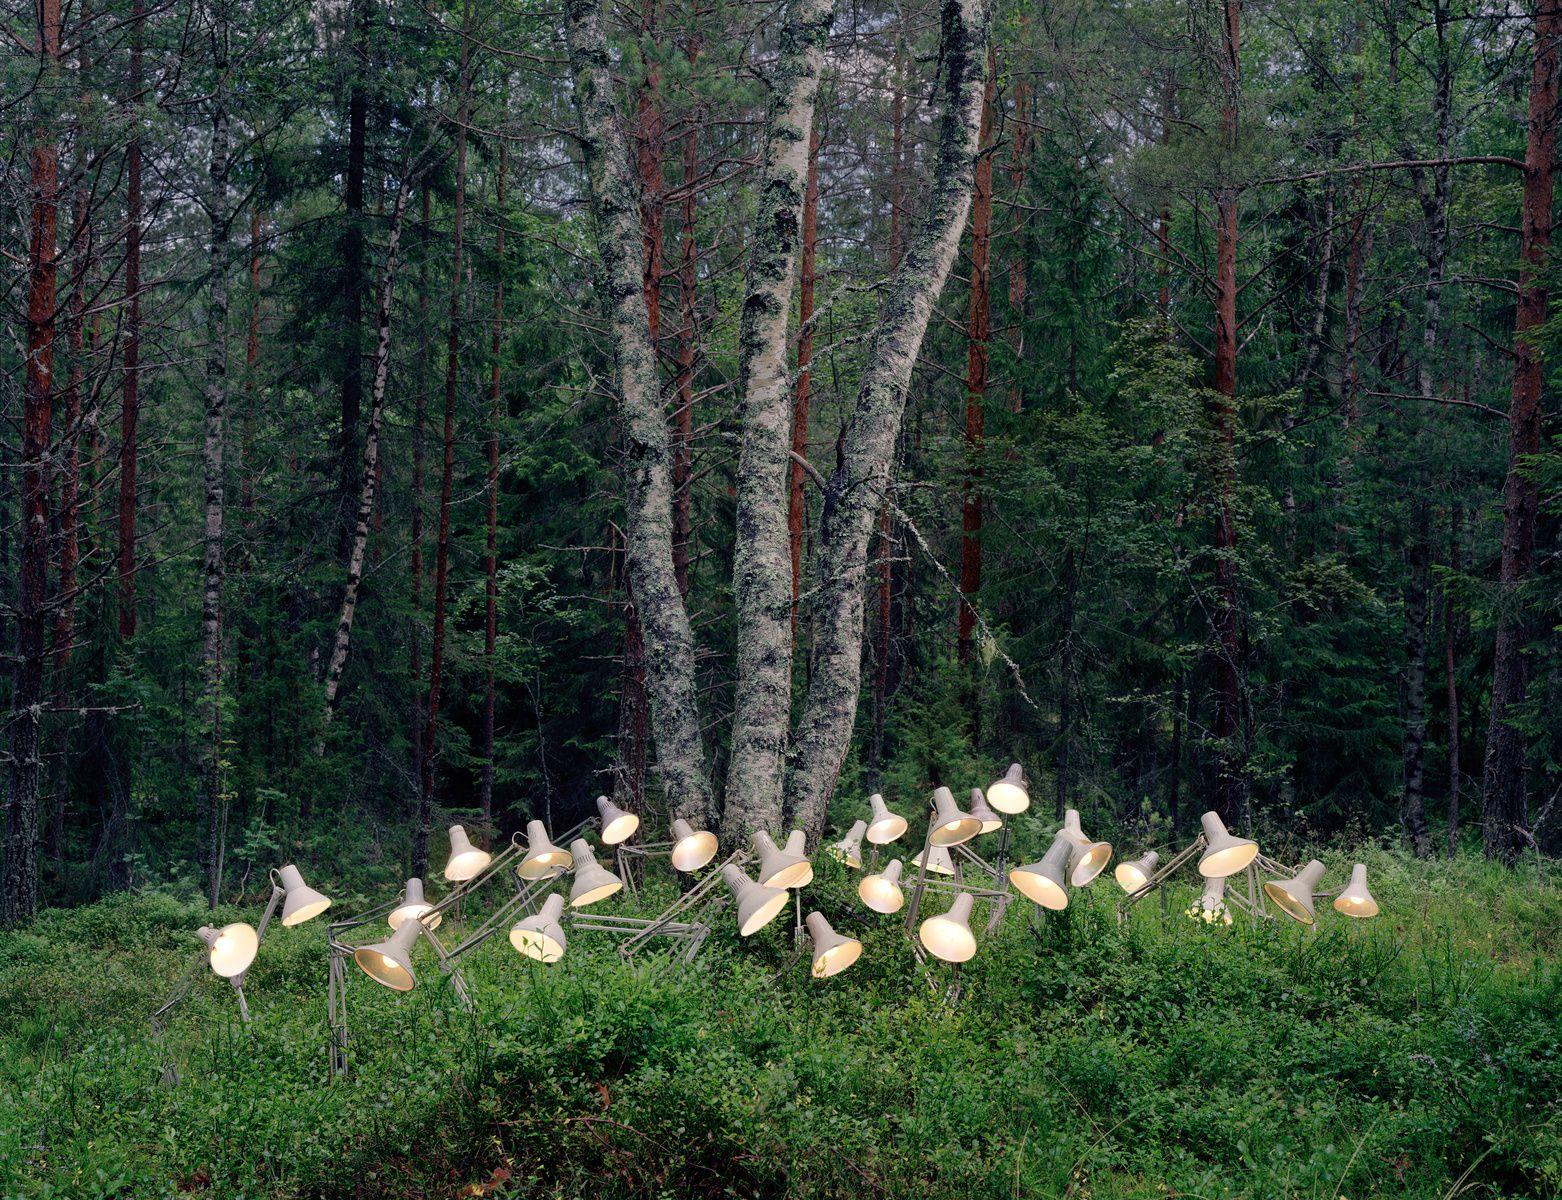 Rune Guneriussen,Fake state of interdependence, 2012